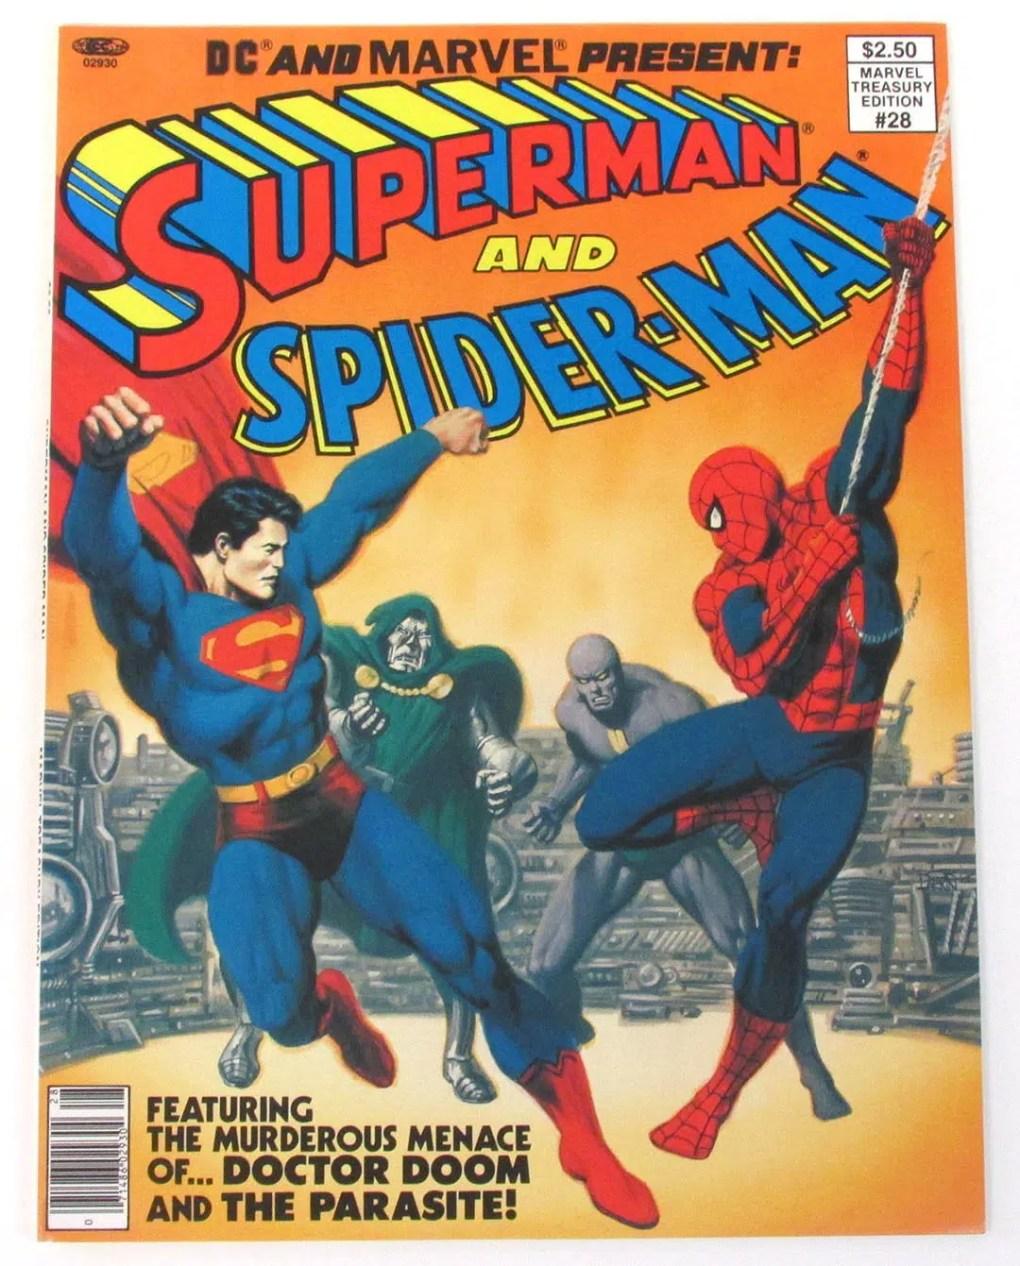 JIM SHOOTER SUPERMAN SPIDER-MAN